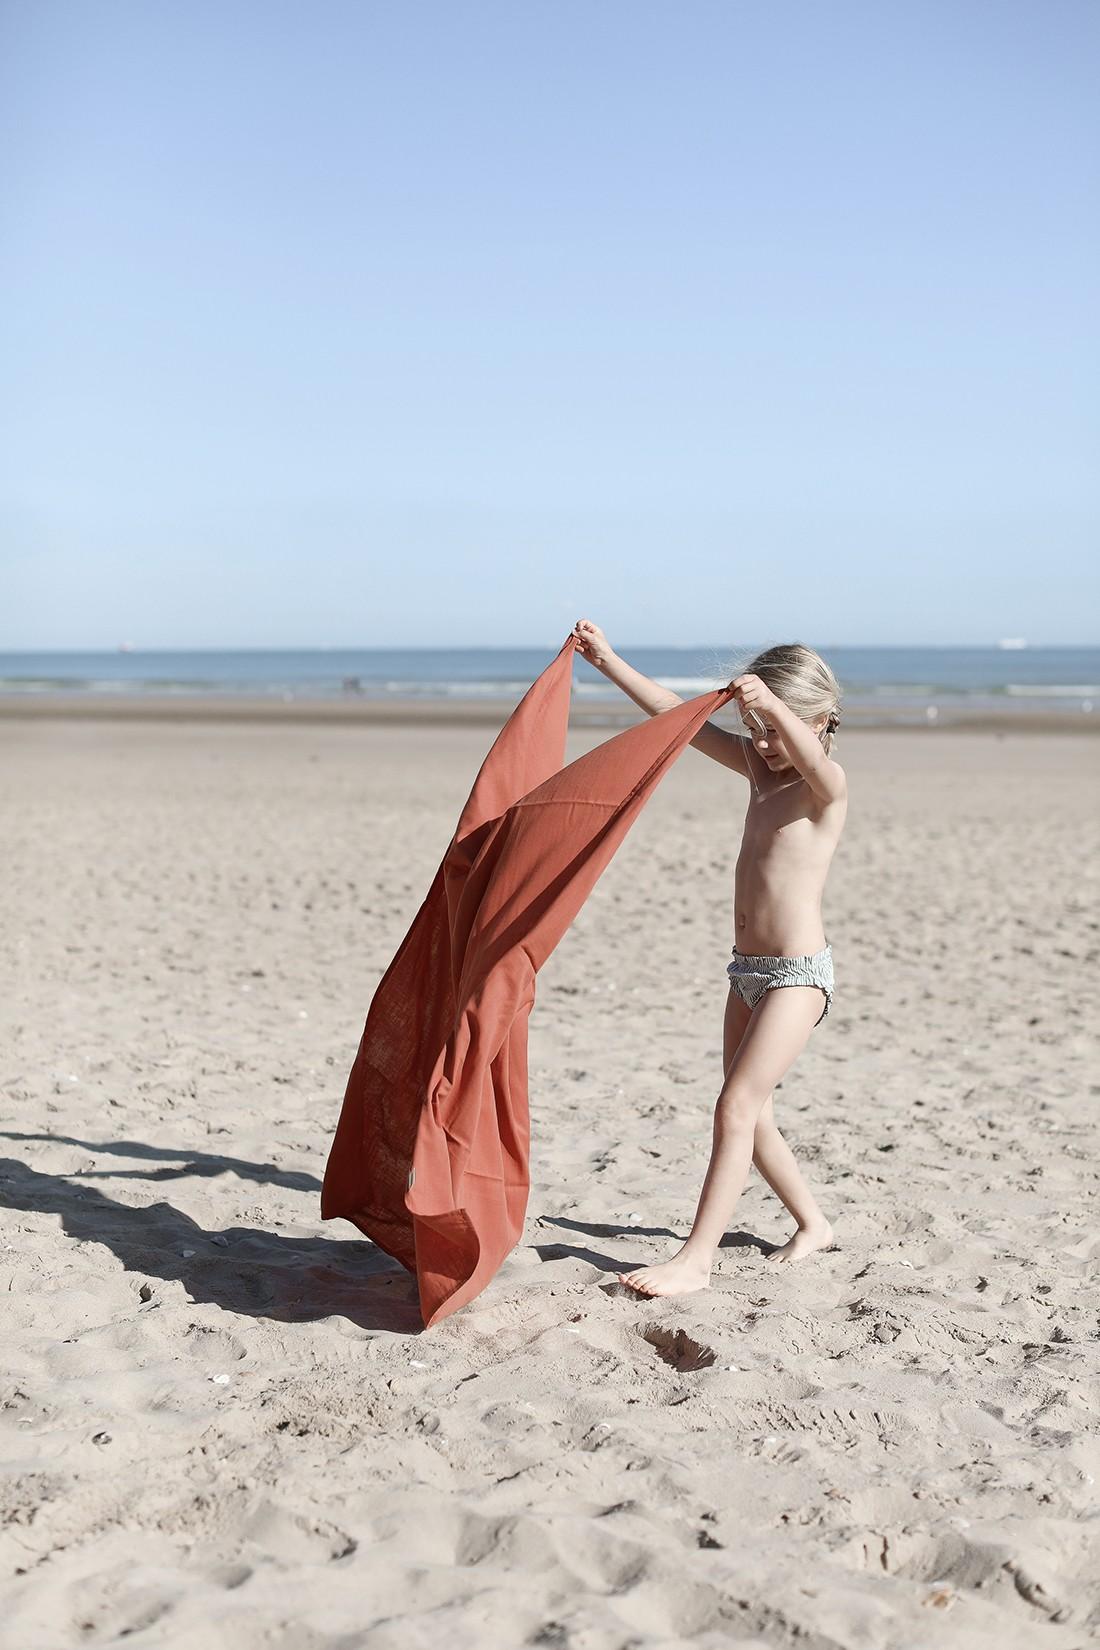 Foutas de plage